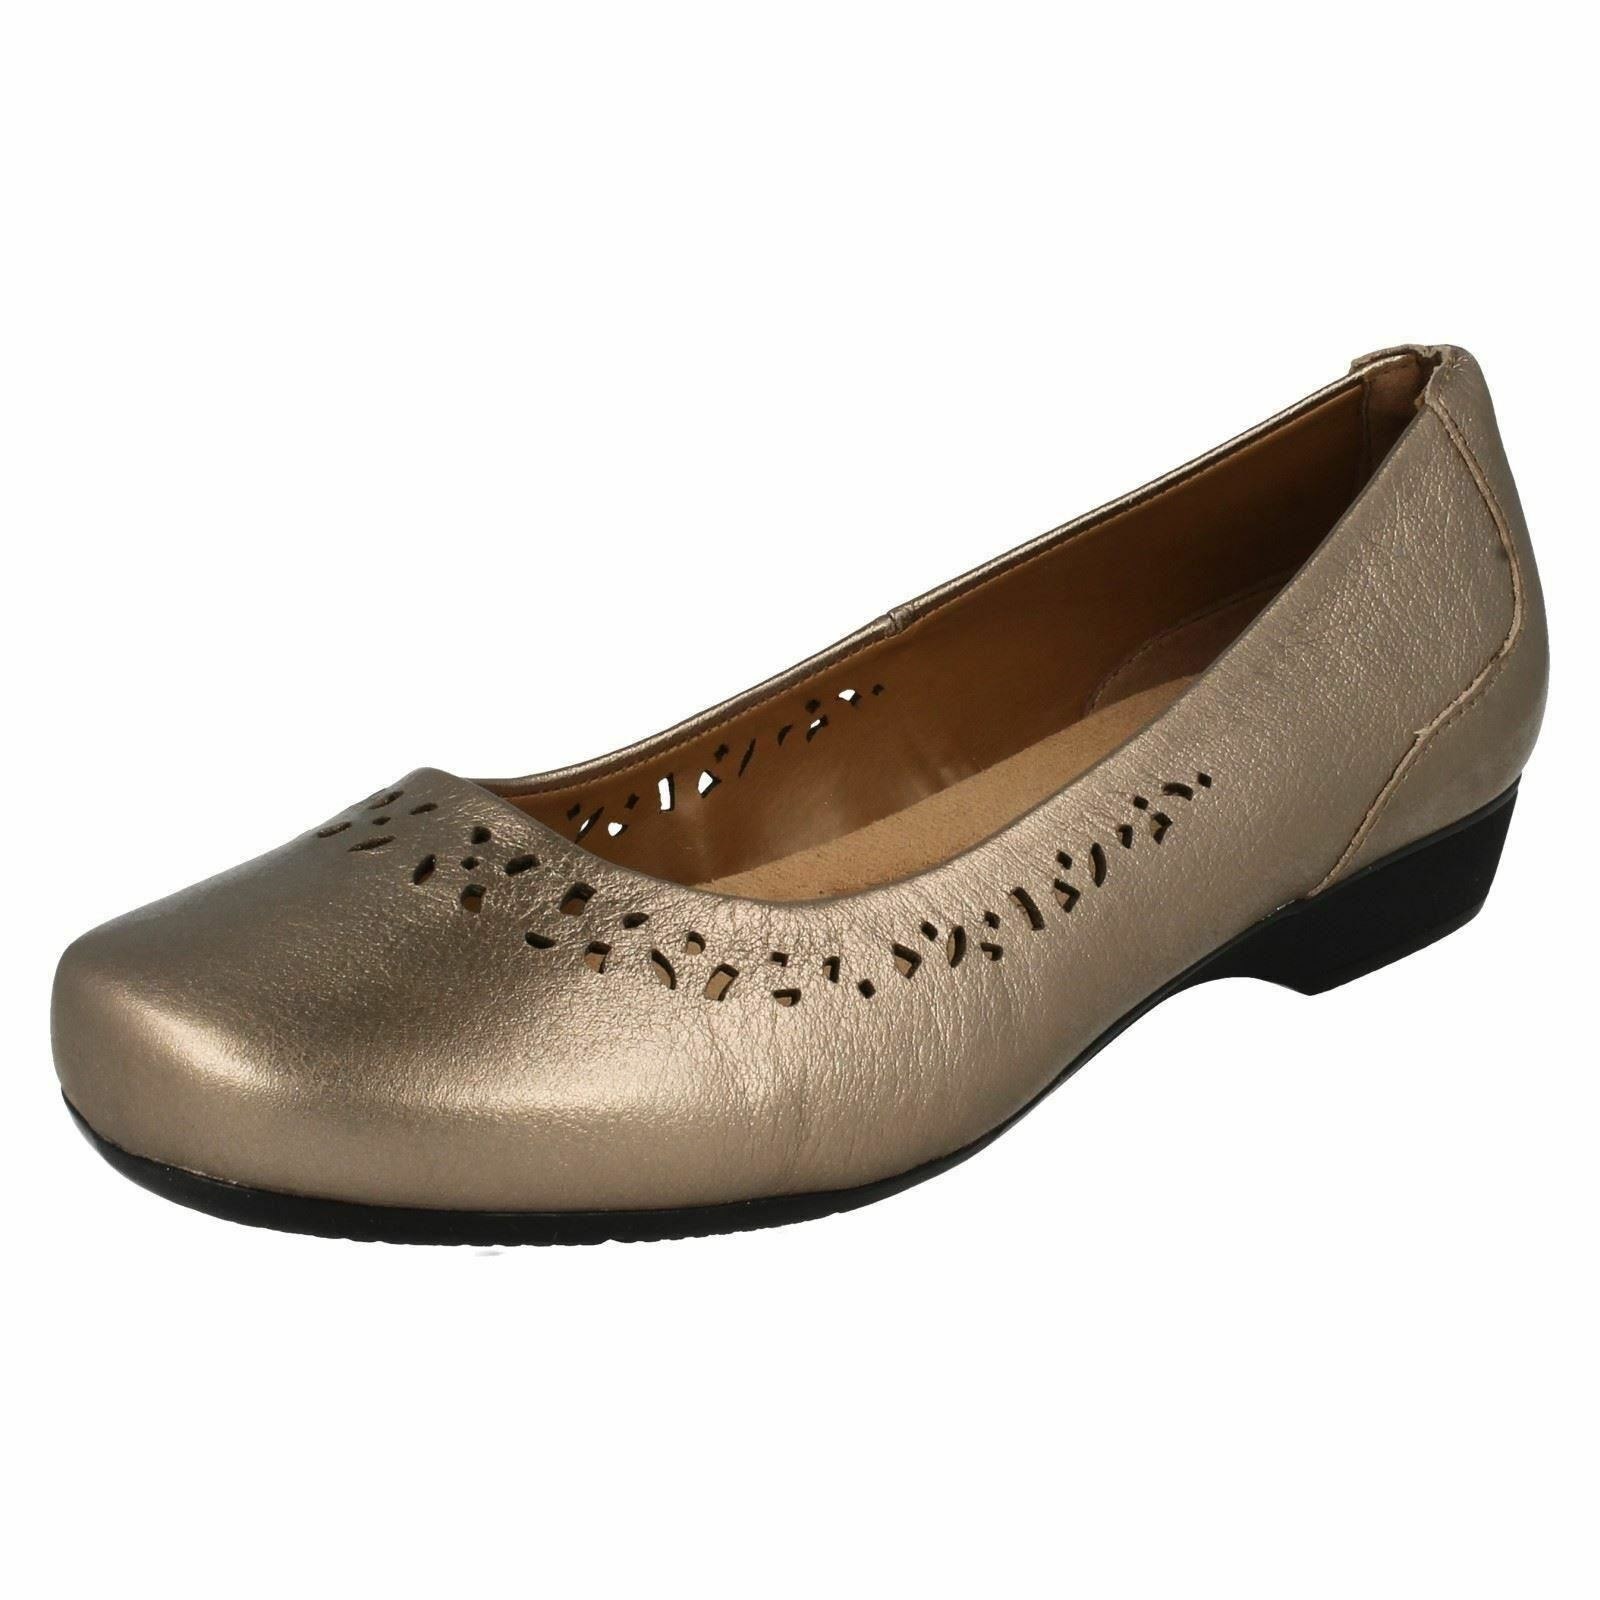 CLARKS LADIES GOLD METALLIC LEATHER GARRYN SLIP ON SHOE BLANCHE GARRYN LEATHER 5ec379